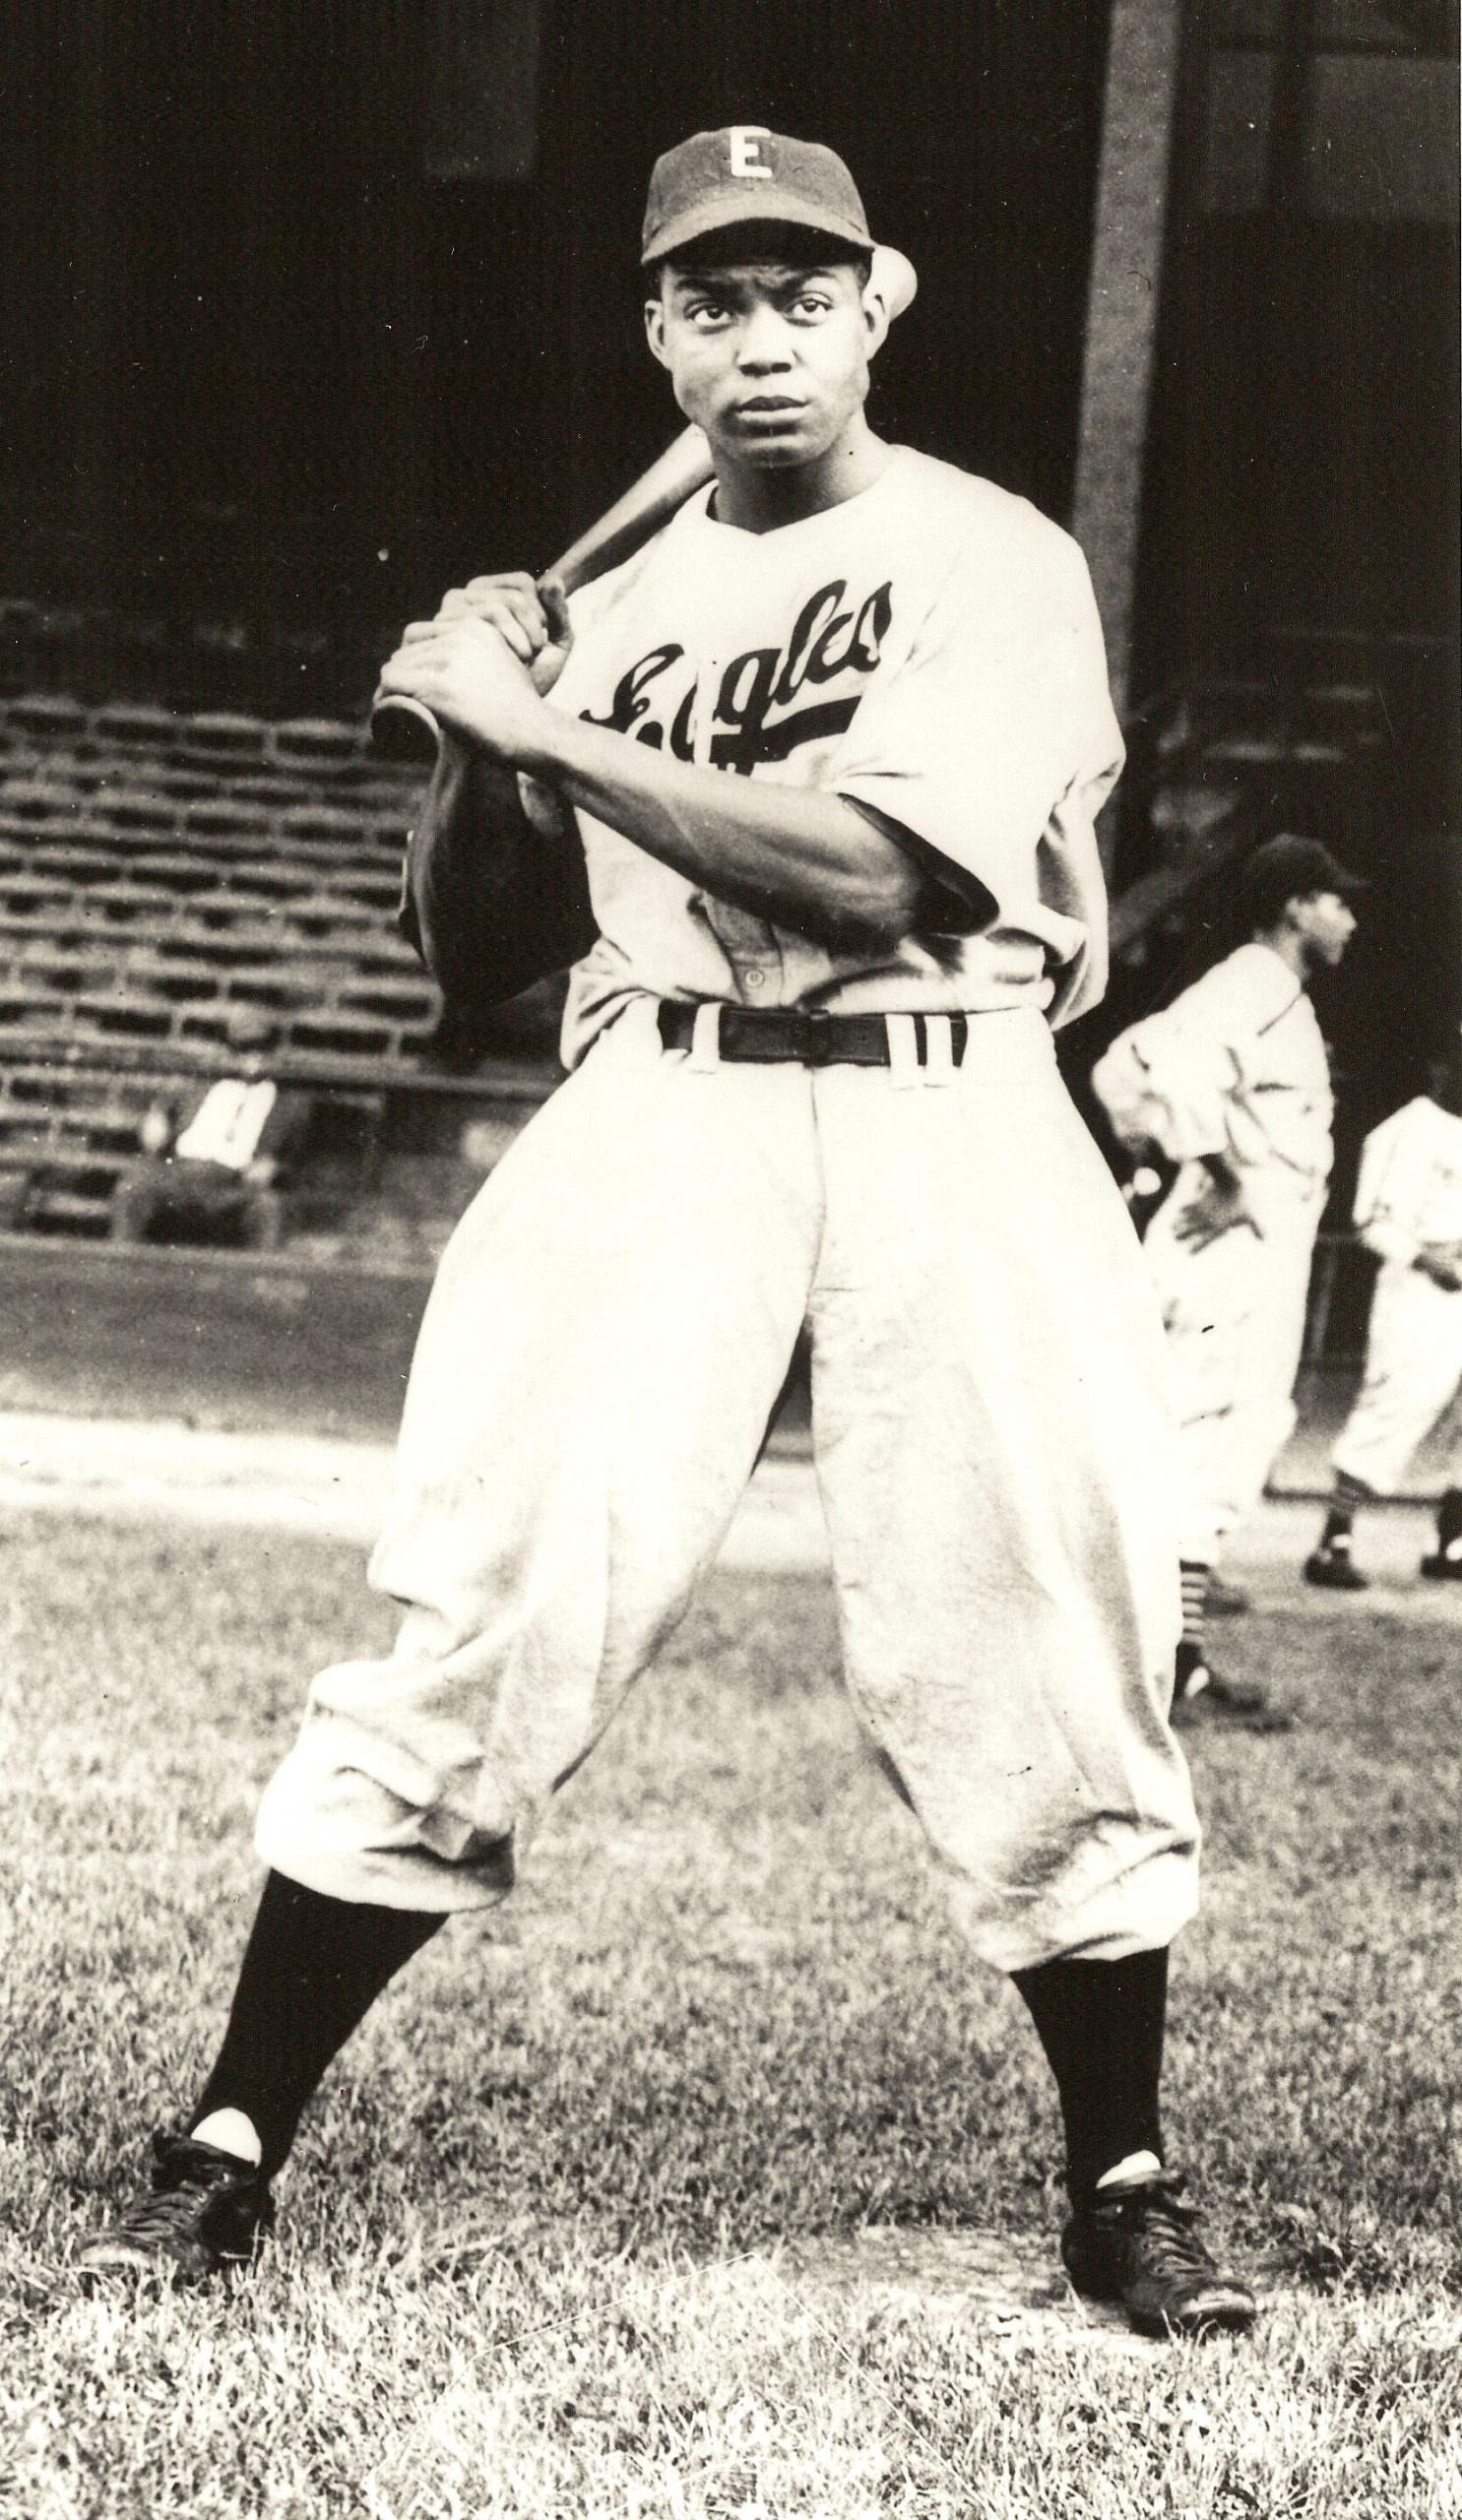 Monte Irvin with the Newark Eagles (NOIRTECH, INC.)